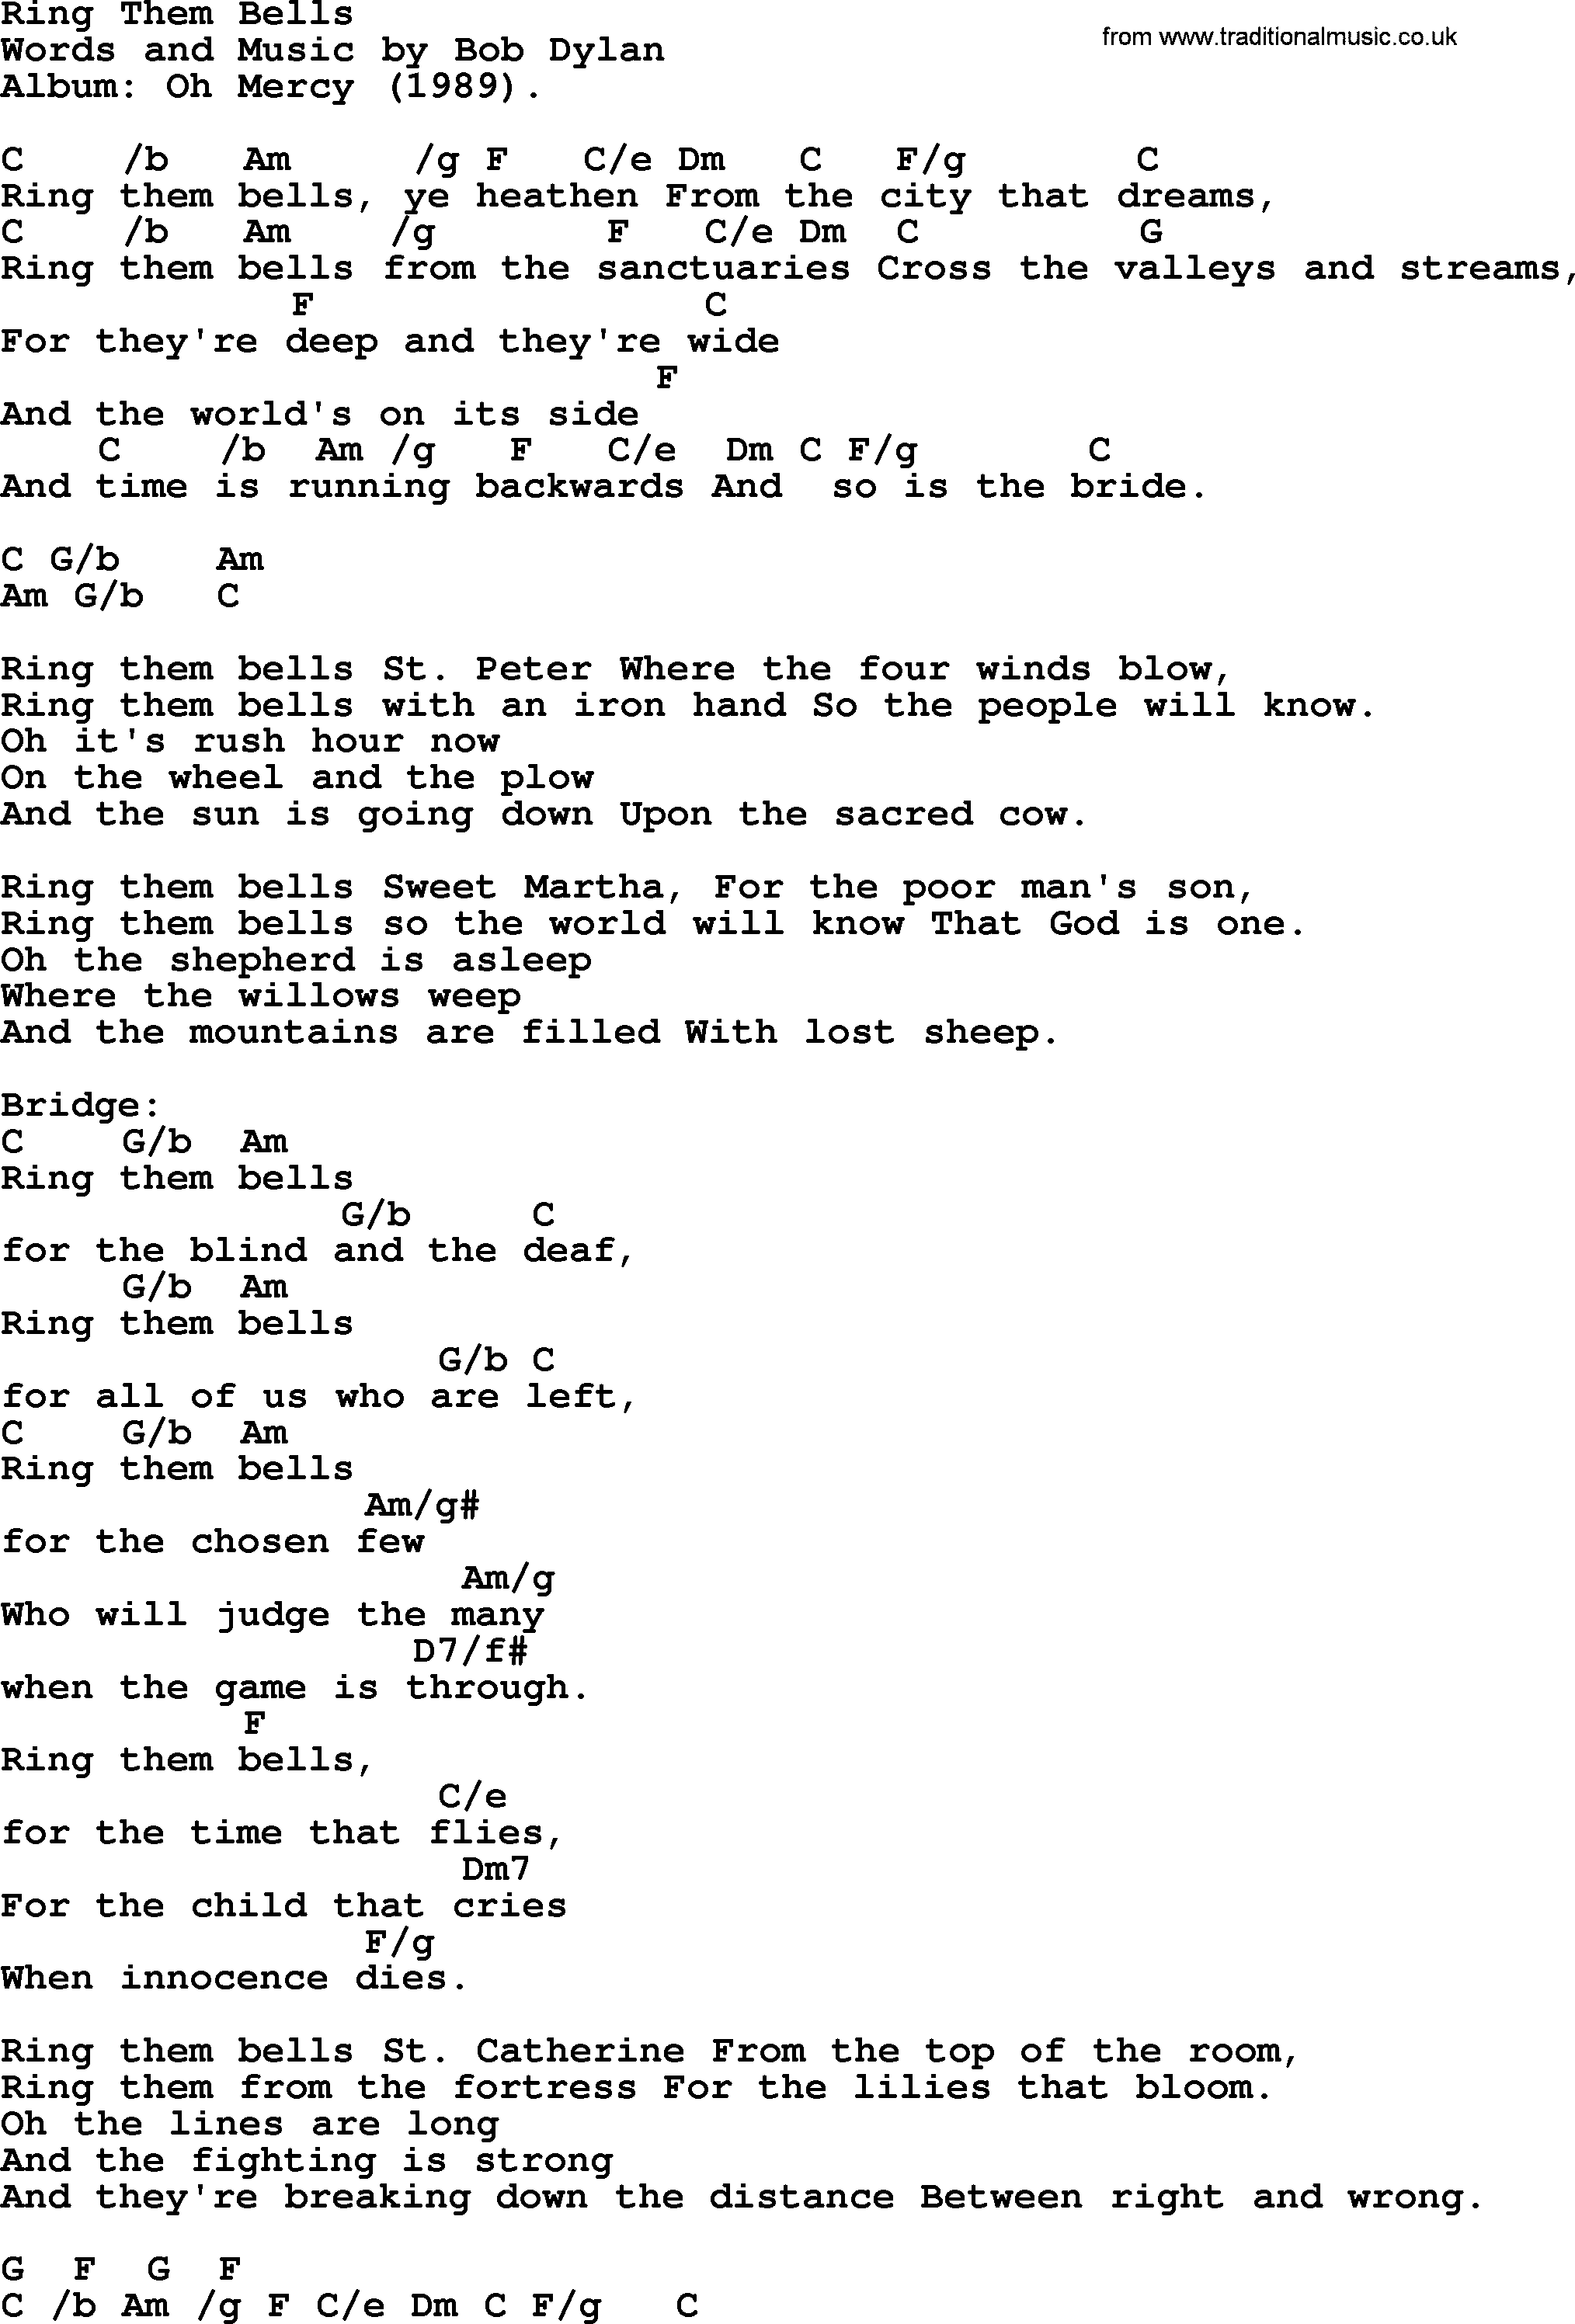 Bob Dylan song, lyrics with chords - Ring Them Bells